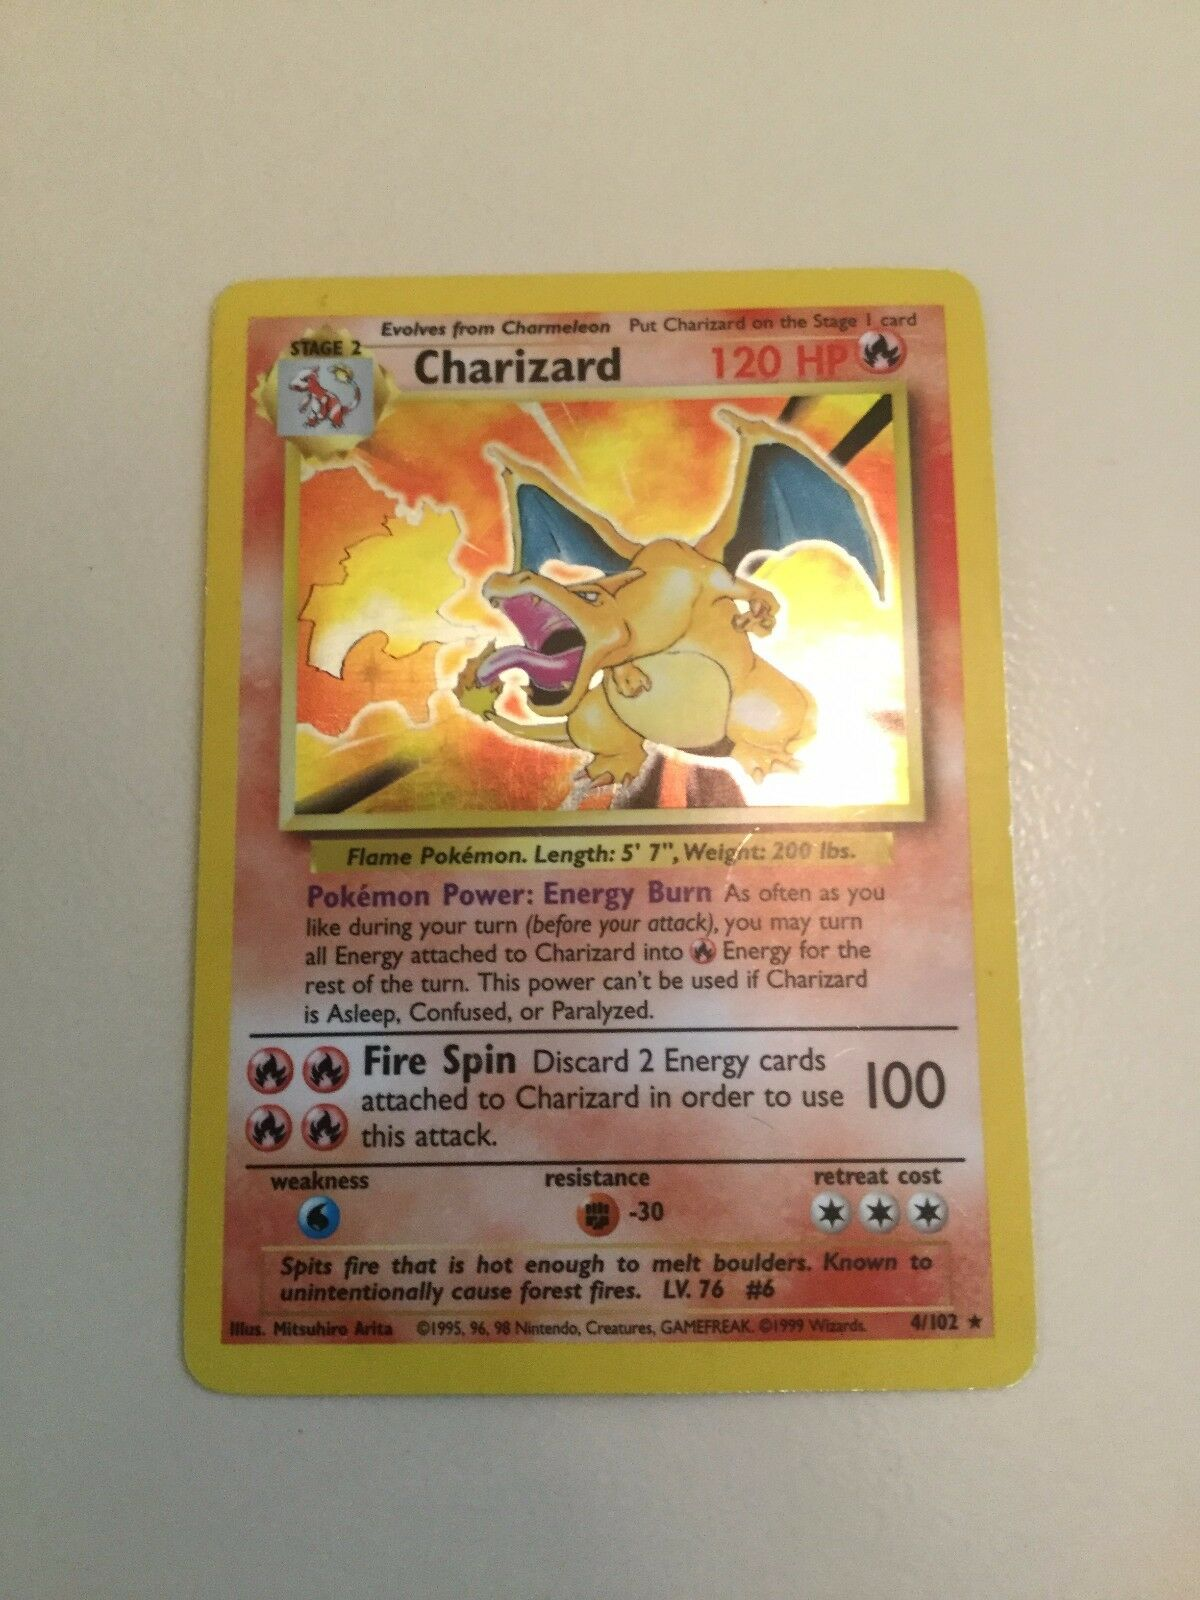 4 102 Charizard holo base set rare good cond. Pokemon card